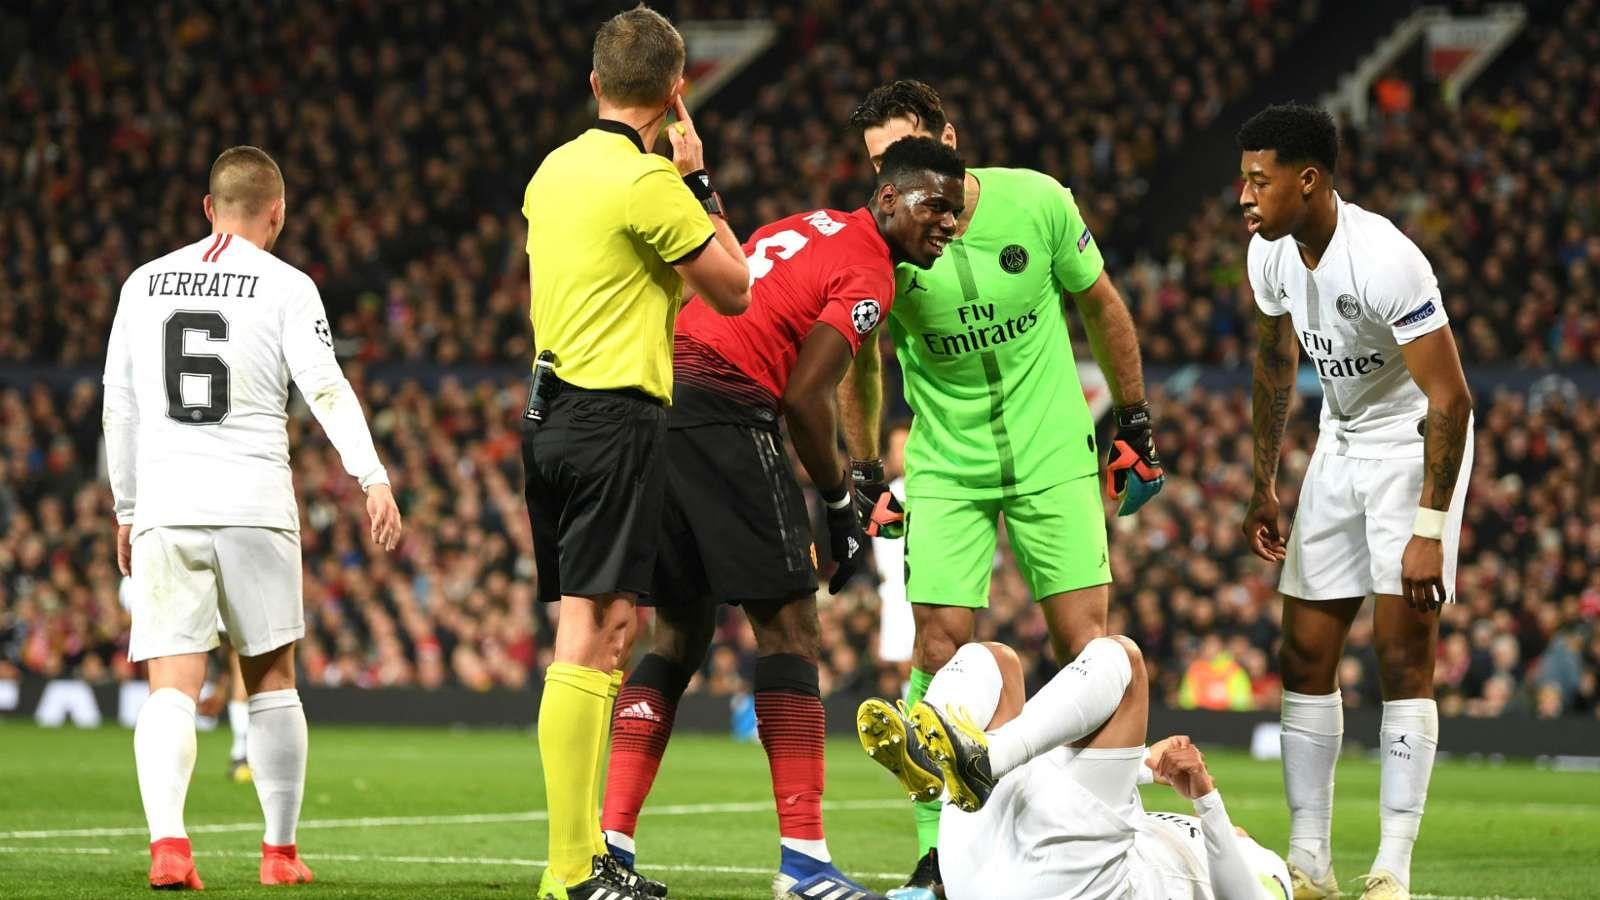 MANCHESTER UNITED 0 VS PSG 2 HIGHLIGHTS & ALL GOALS. Paul Pogba was sent  off as Paris Saint-Germain won 2-0 at Manchester Un… | Manchester united,  Manchester, Psg